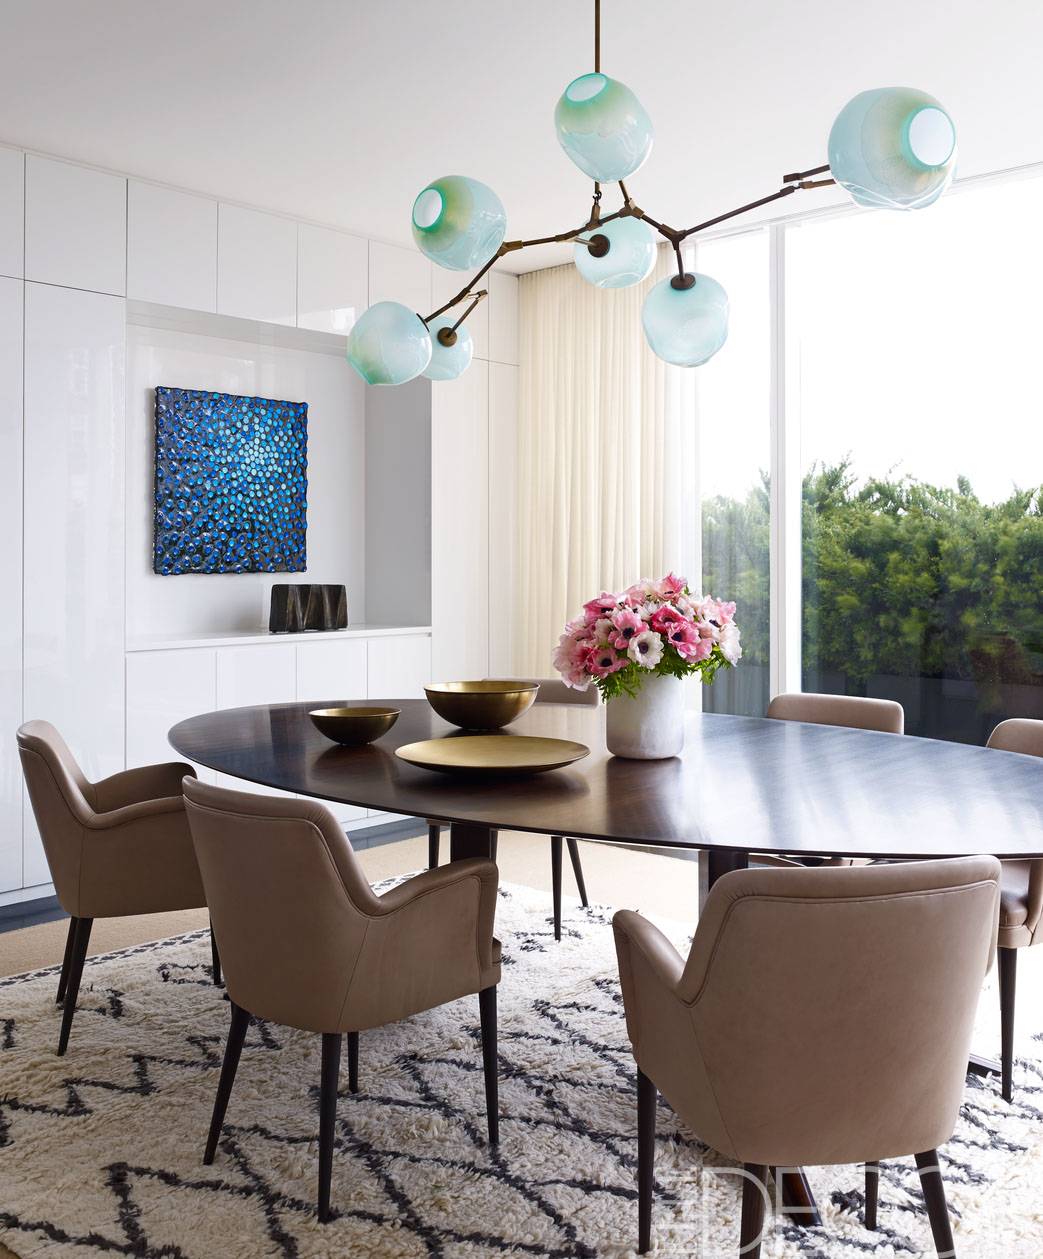 Beautiful 25 Modern Dining Room Decorating Ideas - Contemporary Dining Room Furniture modern dining room design ideas